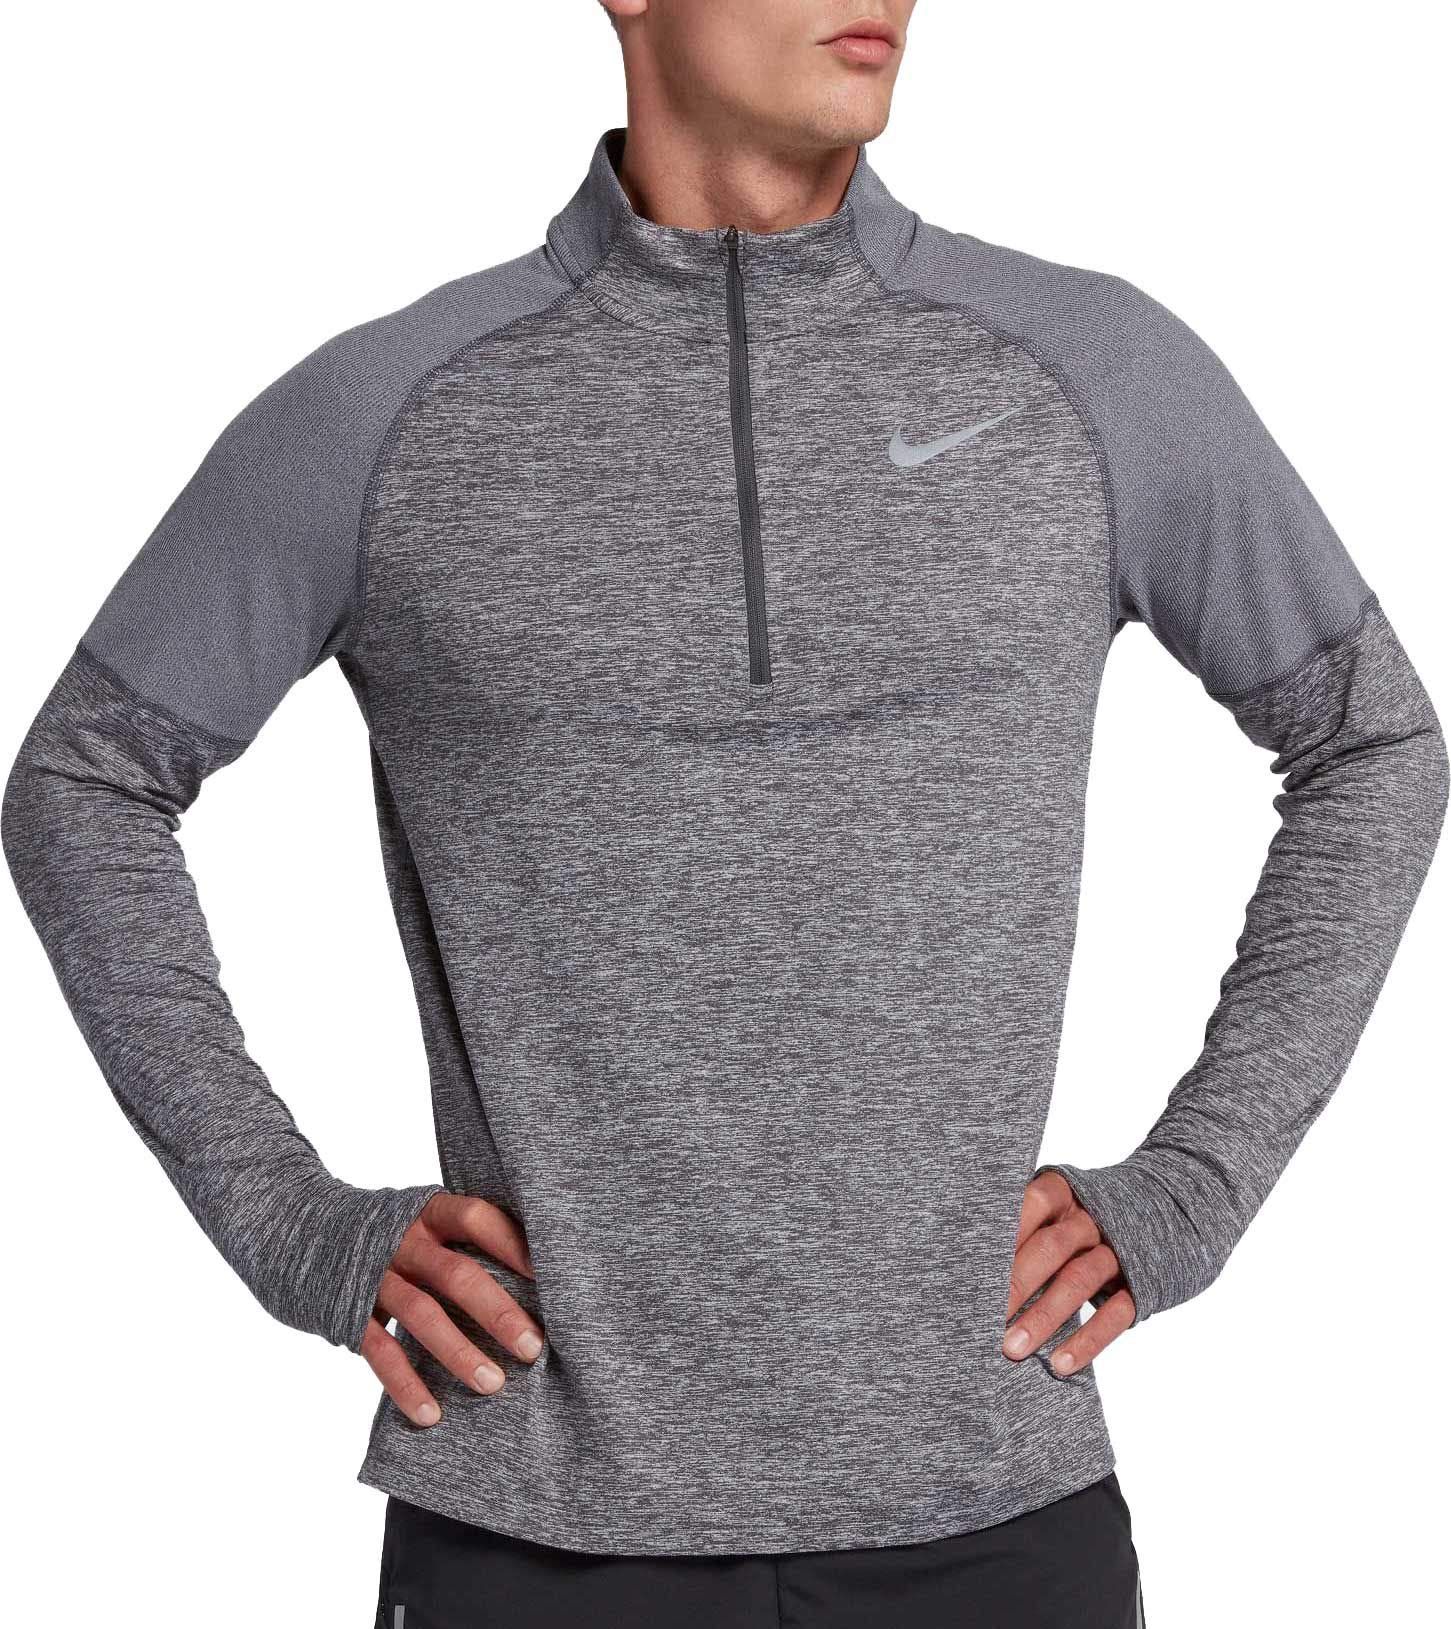 Nike Men's 2.0 Element 1/2 Zip Running Top (Dark Grey/Heather, Medium) by Nike (Image #1)